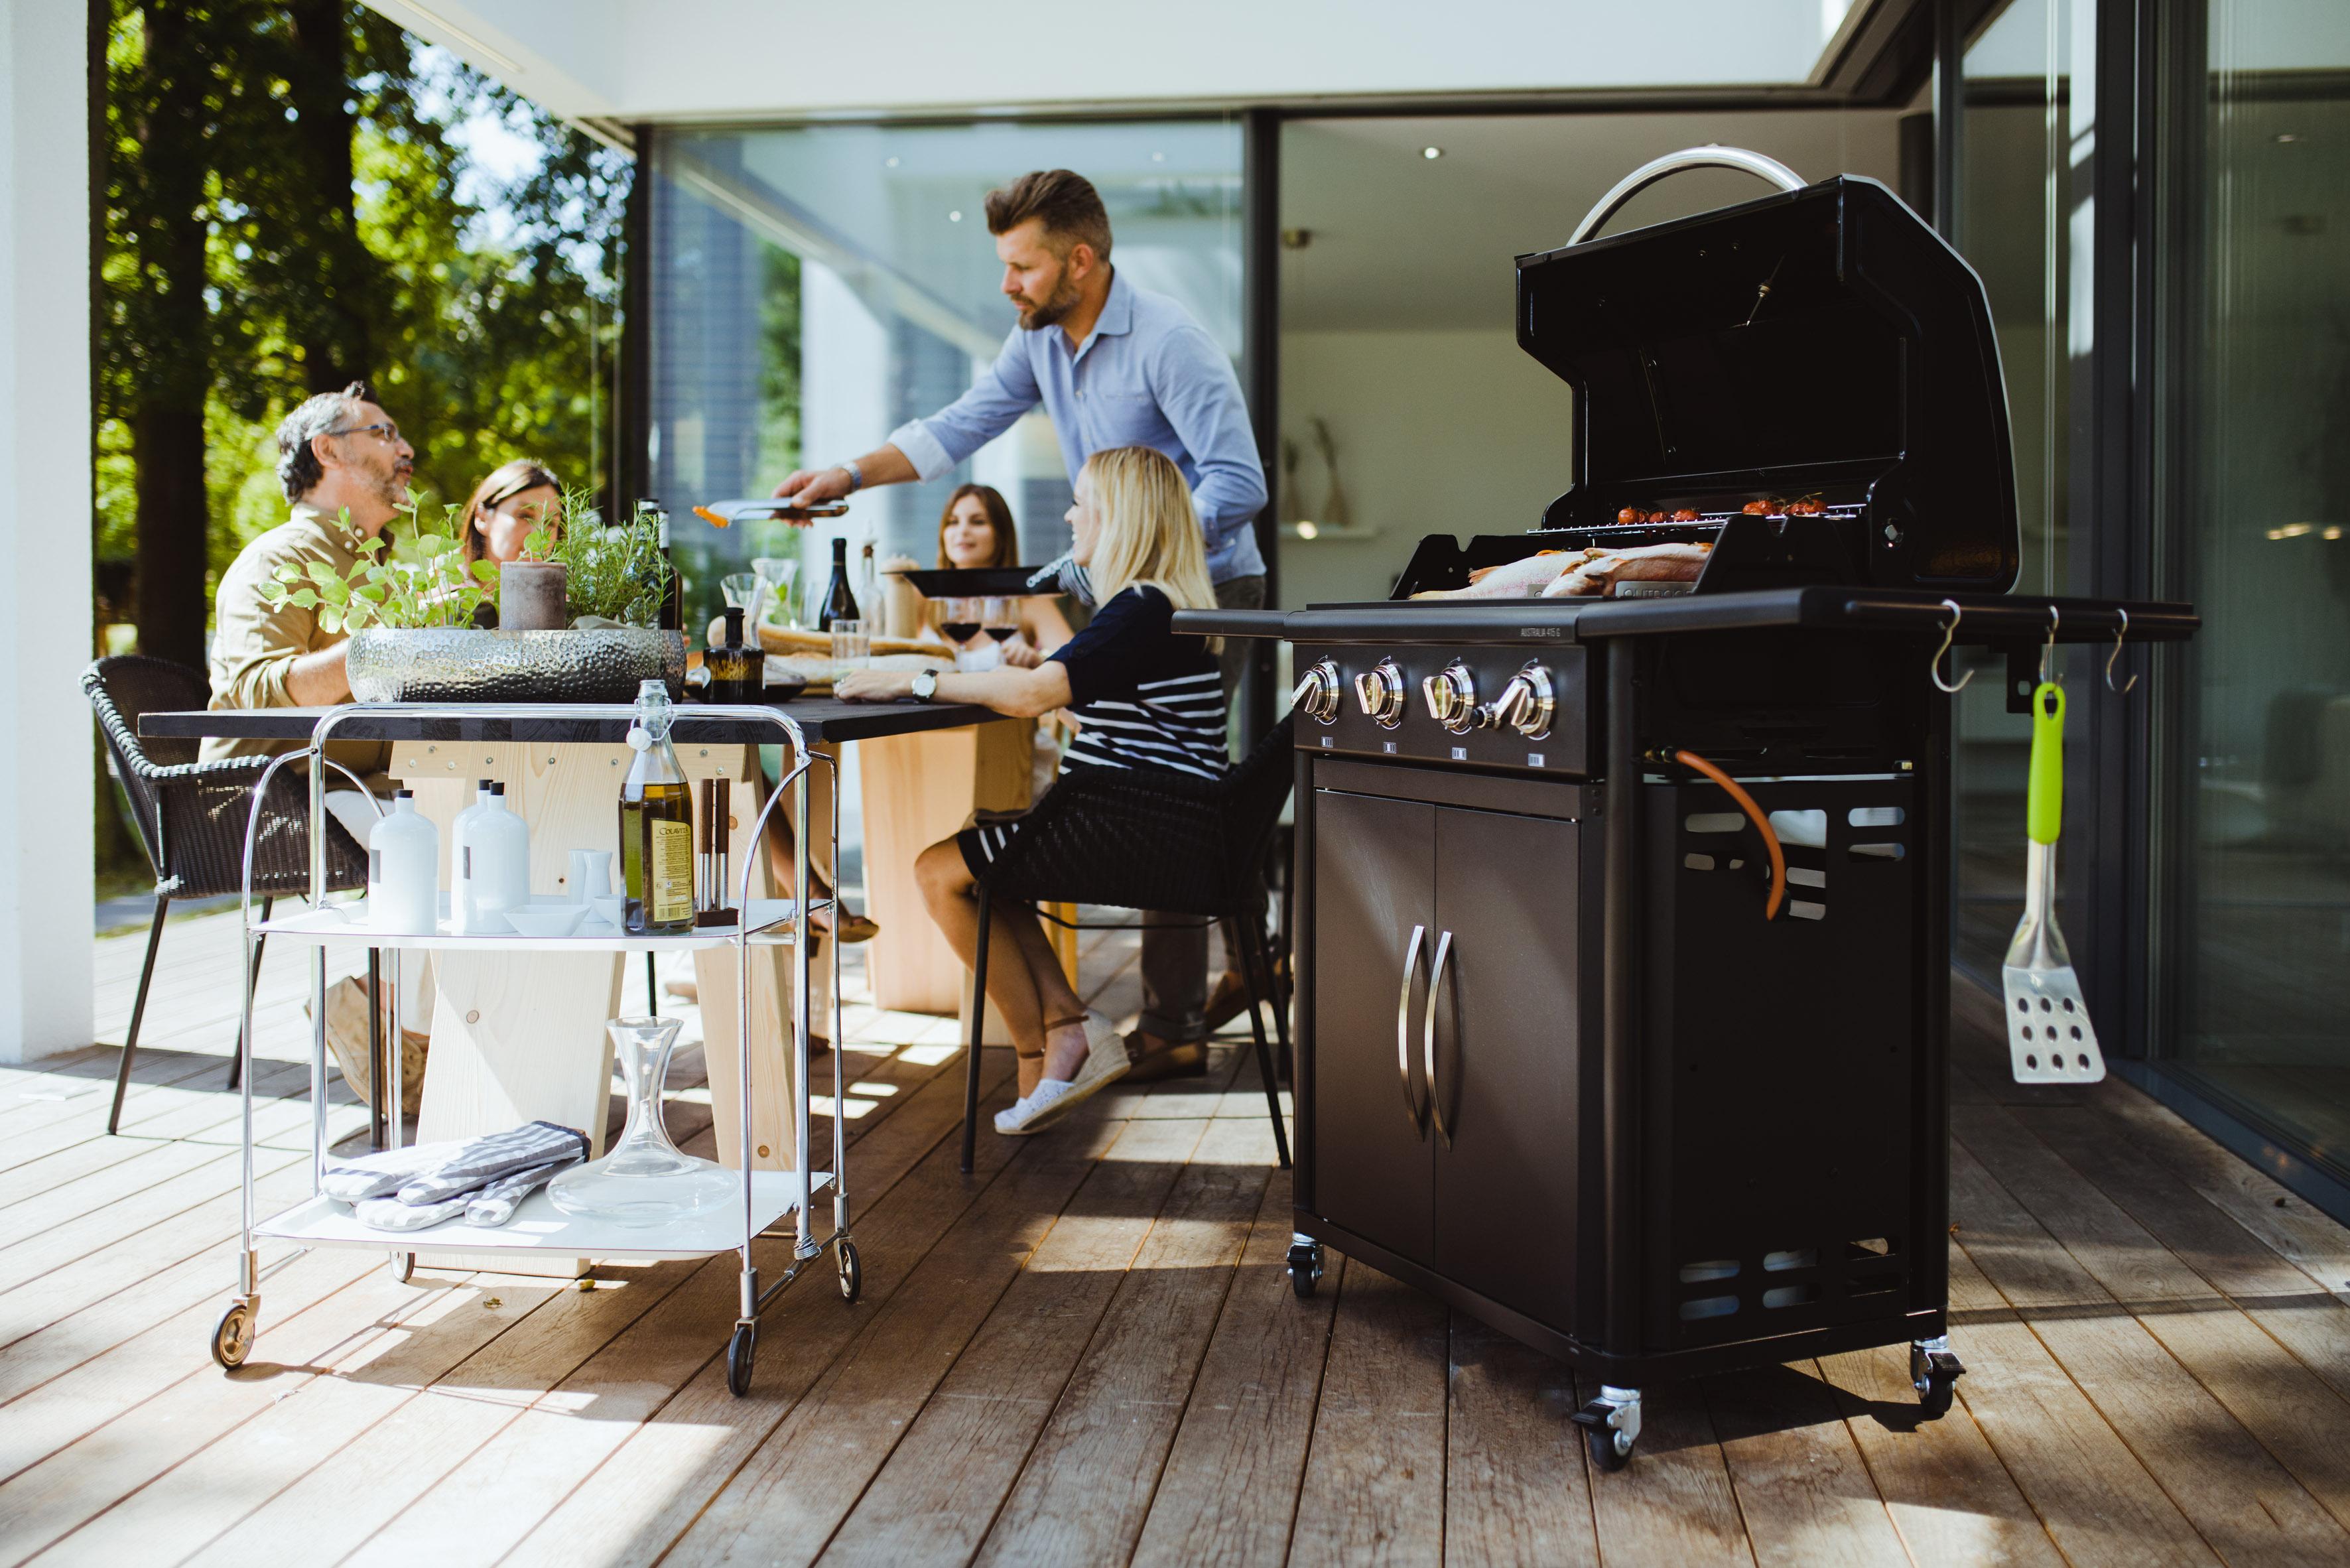 Outdoorchef Elektrogrill City Test : Xxl outdoorchef grill shop